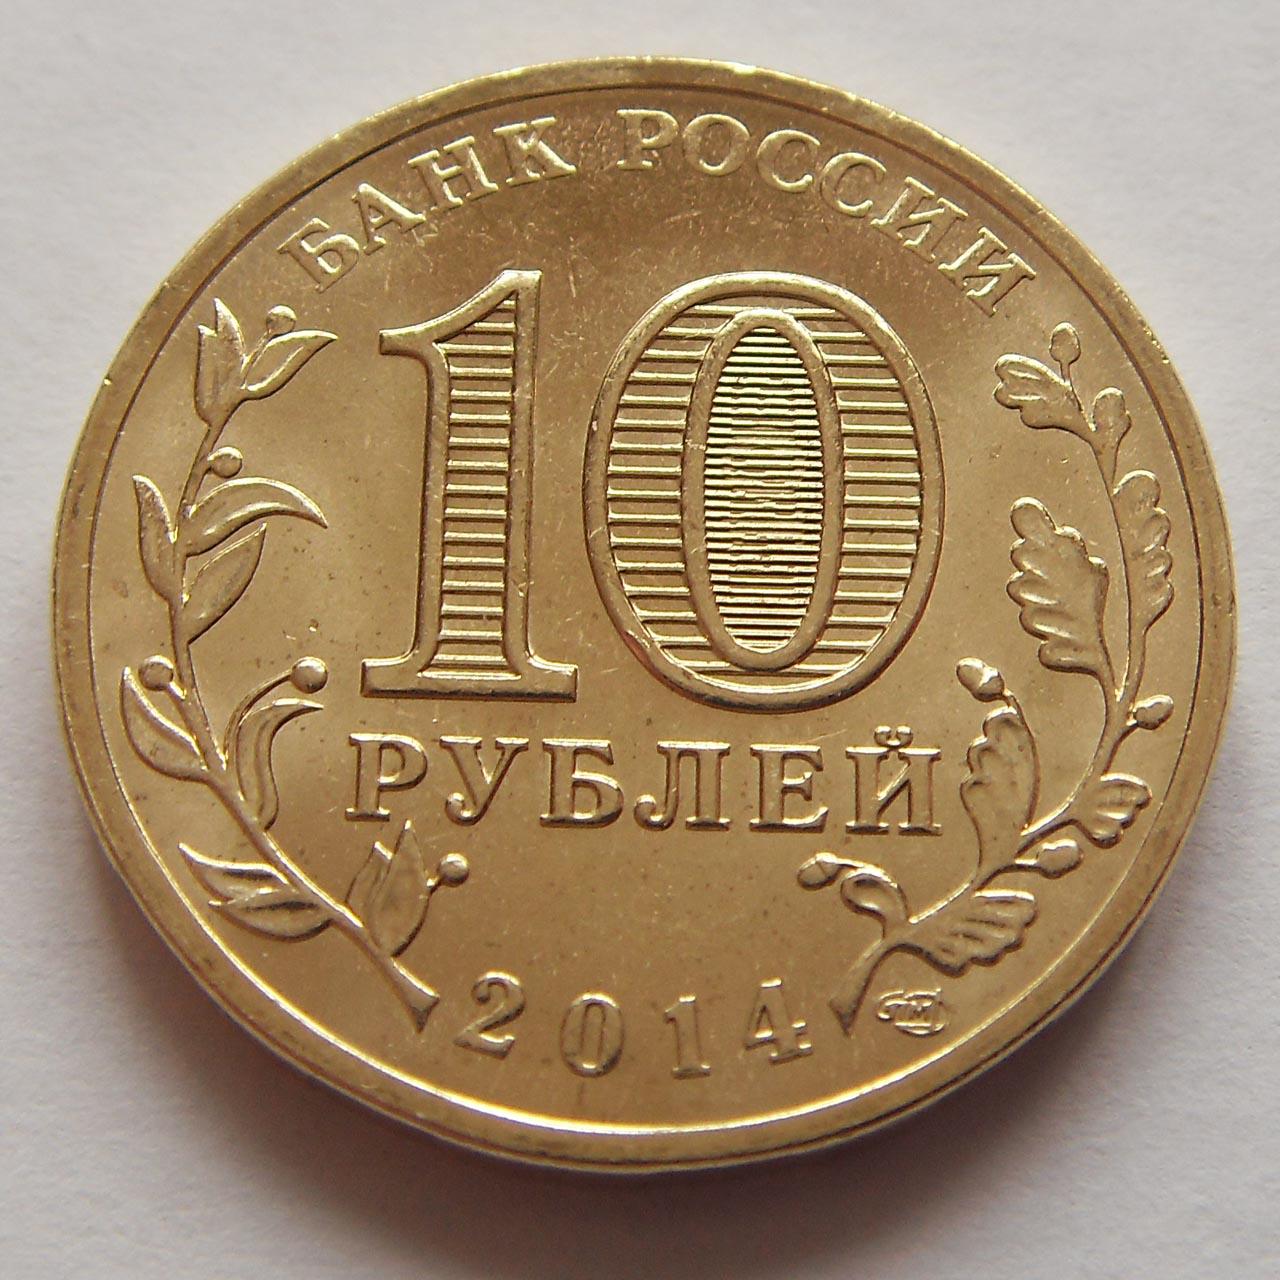 Монета тихвин монета екатерина 2 1780 года цена